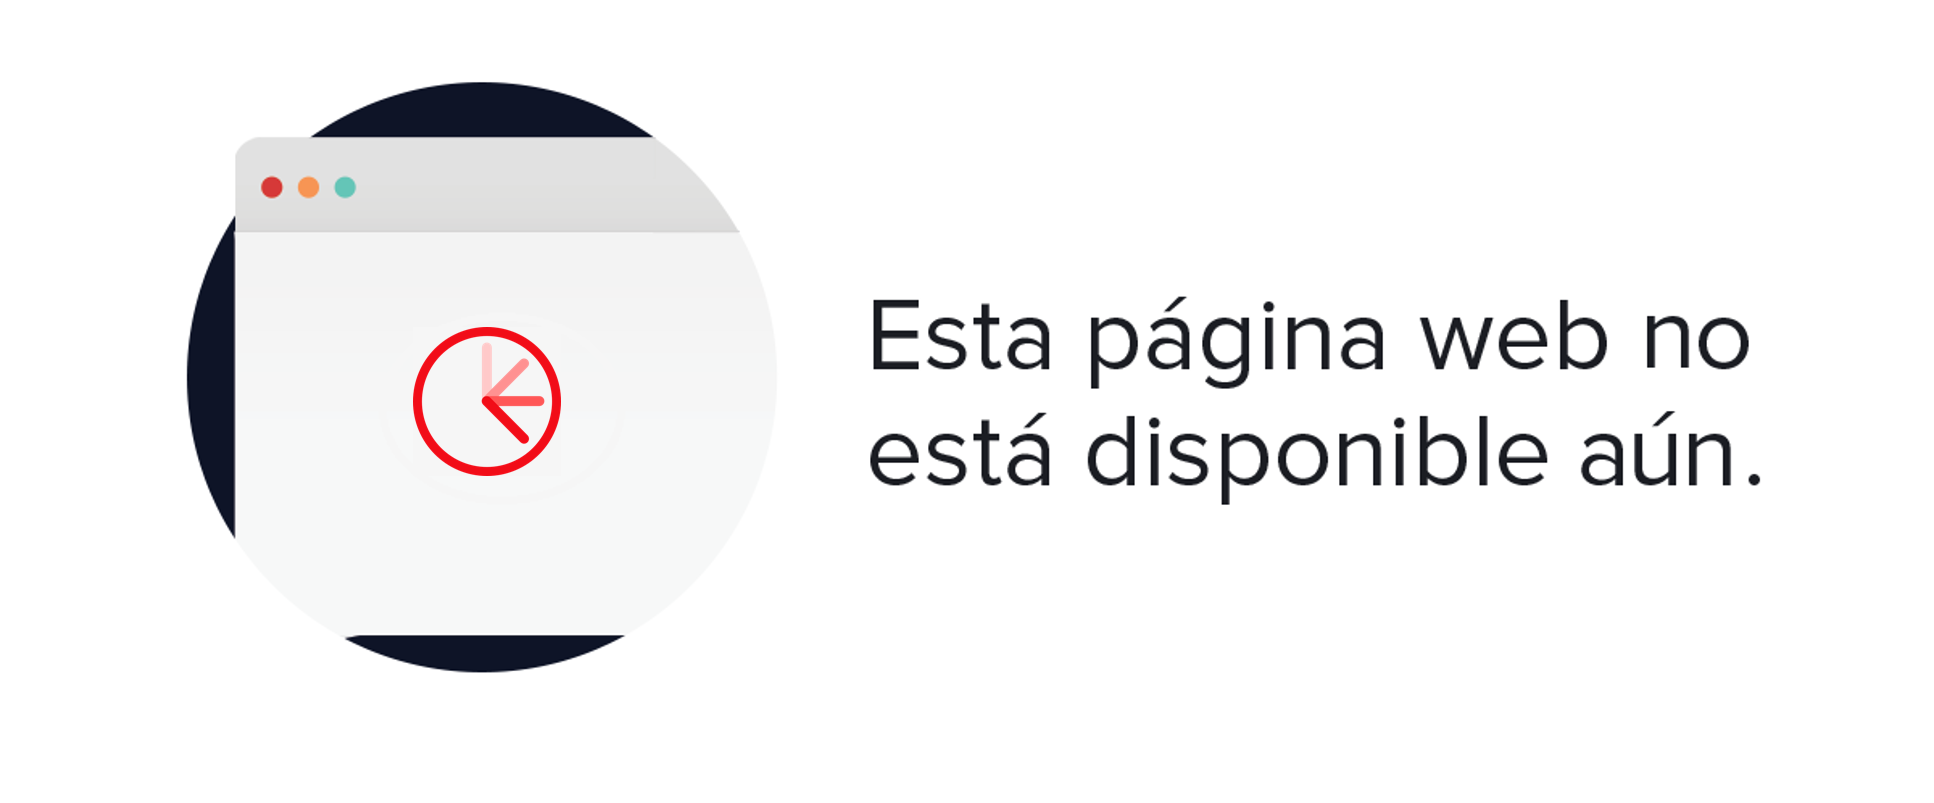 Adolfo Dominguez - Chaqueta de mujer Adolfo Domínguez liso blanca Blanco 8433917461374 - EXMOEKJ